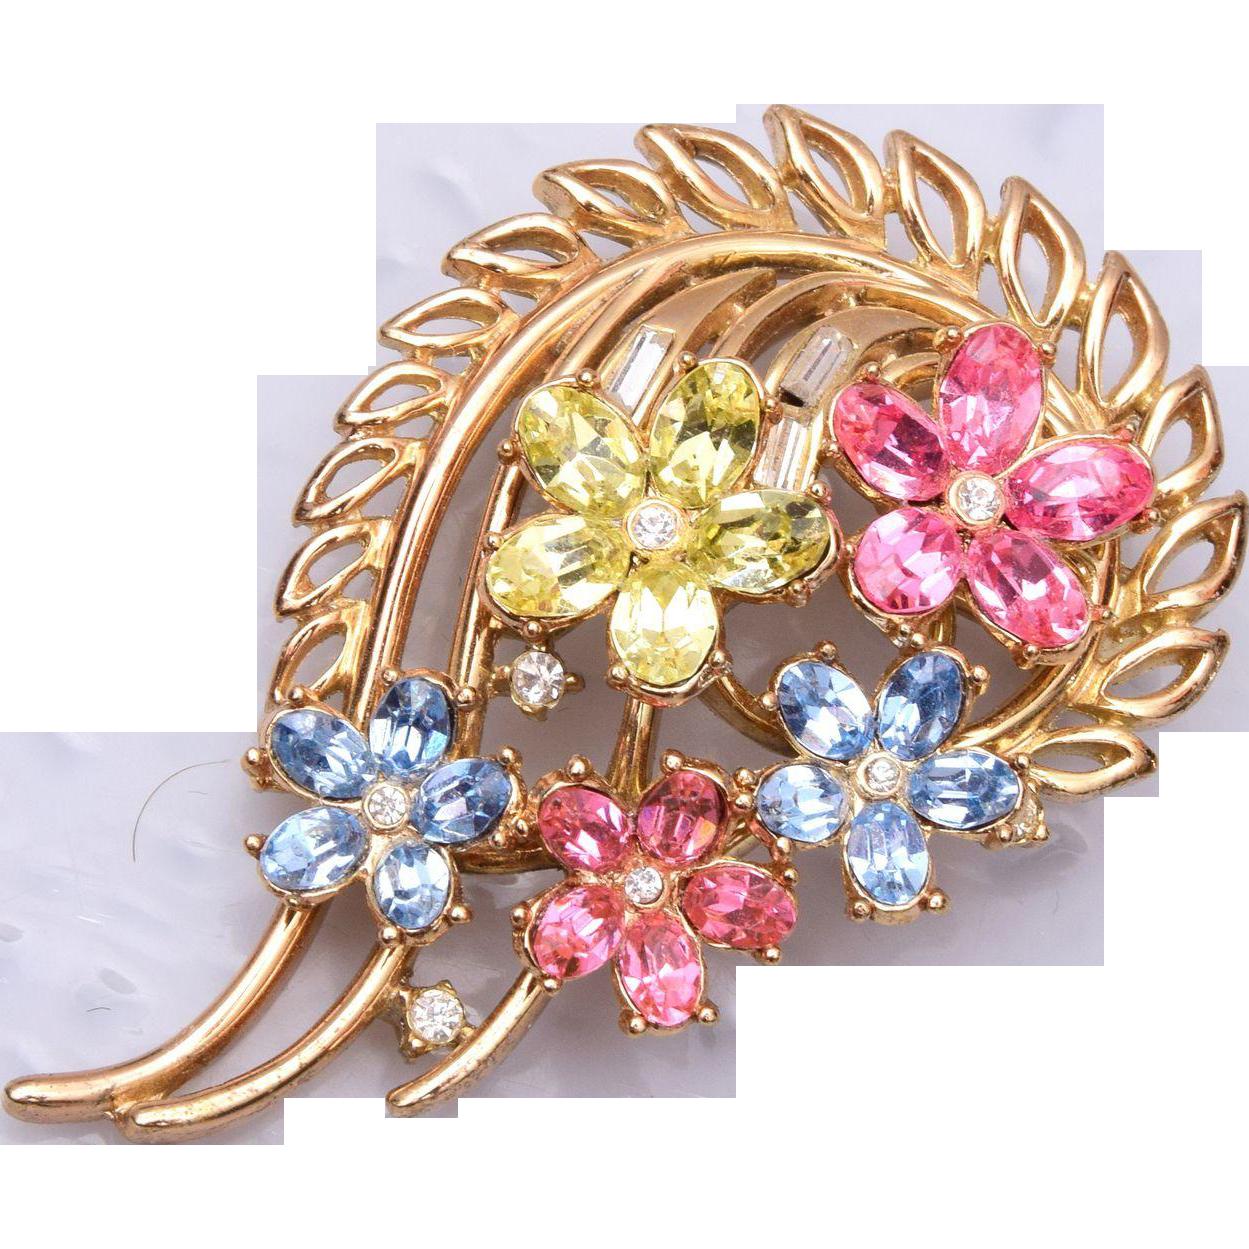 1954 Trifari Patent Pending Pastel Flower Brooch